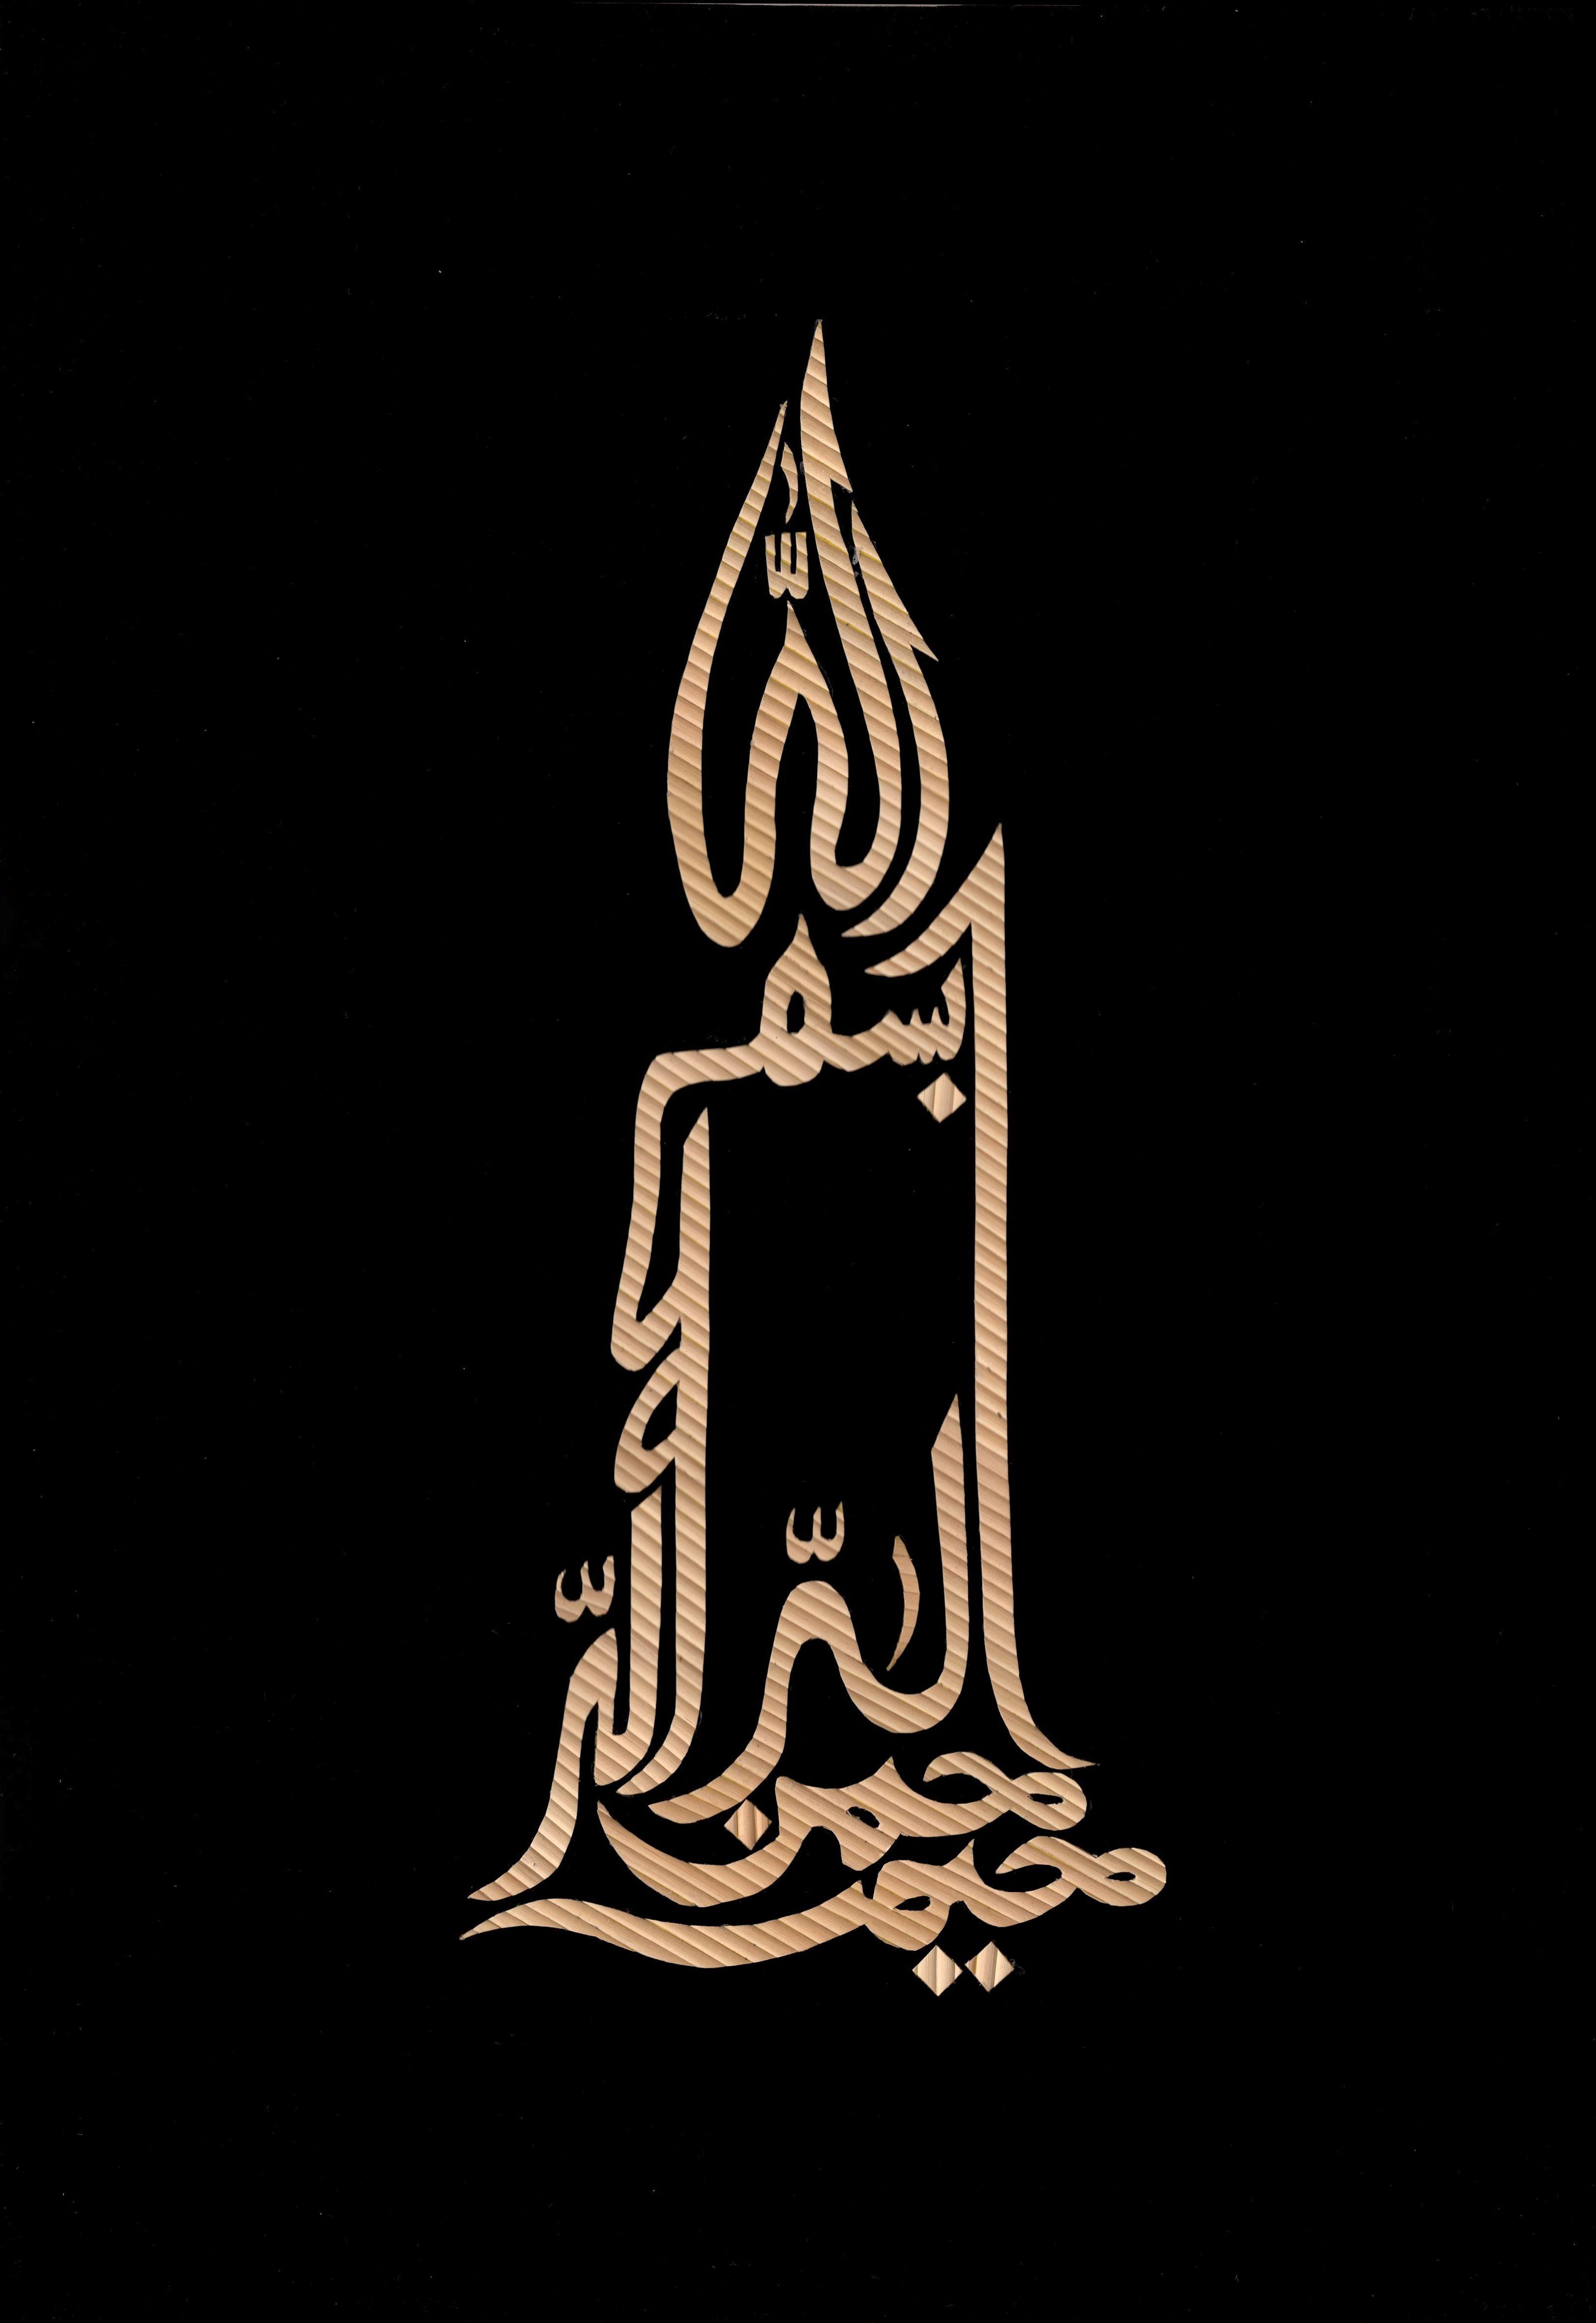 Muslim Wall Decor Art Handmade Islamic Calligraphy Wood ...